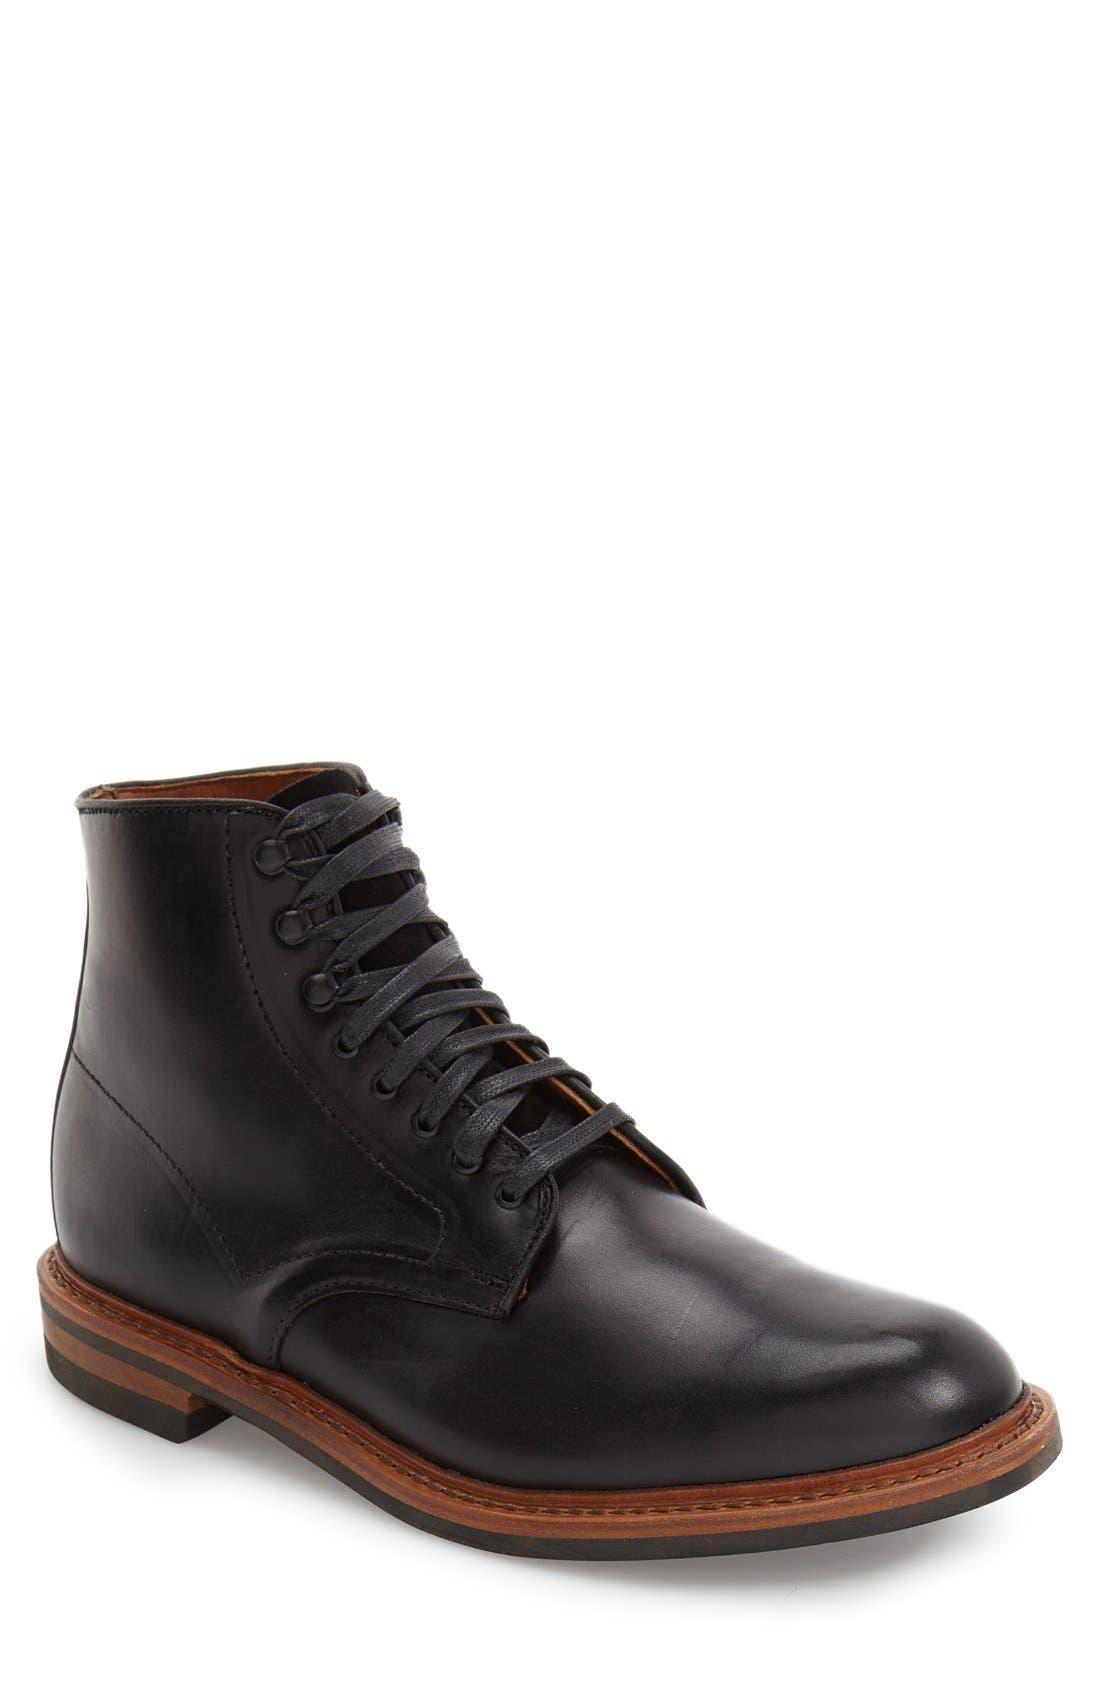 Main Image - Allen Edmonds 'Higgins Mill' Plain Toe Boot (Men)